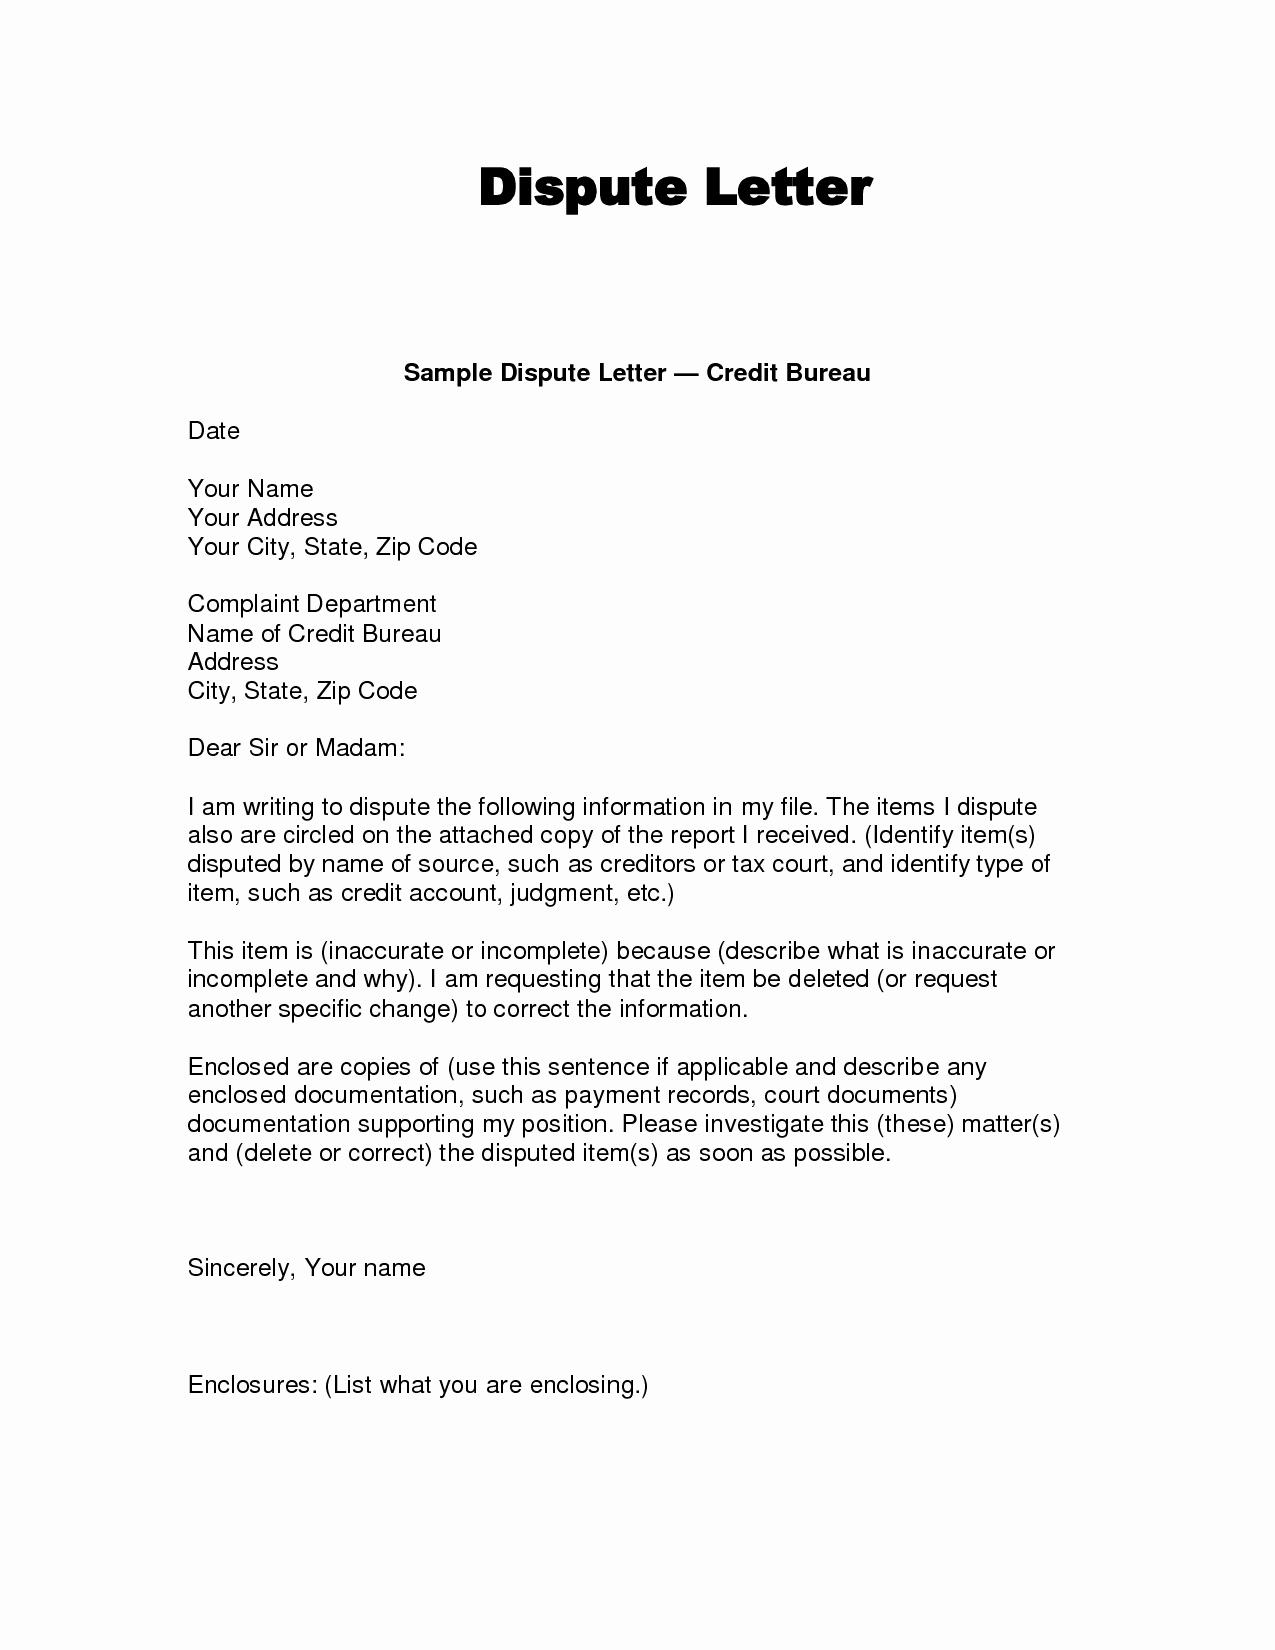 Letter Of Credit Template Unique Dispute Letter to Credit Bureau Template